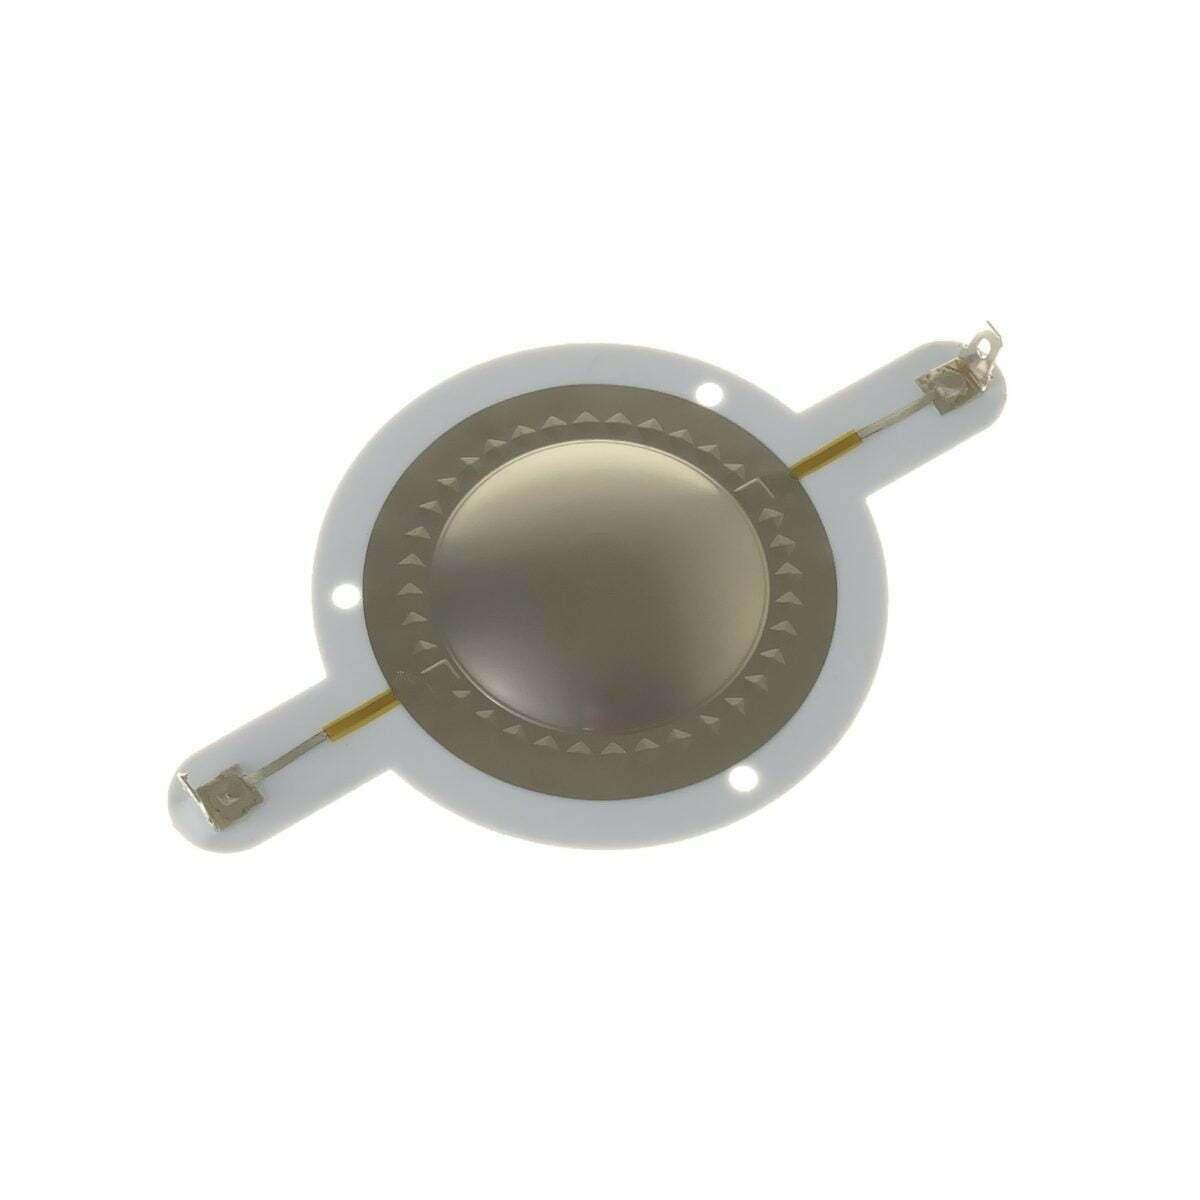 Diaphragm for JBL 2418H, 2418H-1, EON15-G2, MR9 Series, D-2418-4